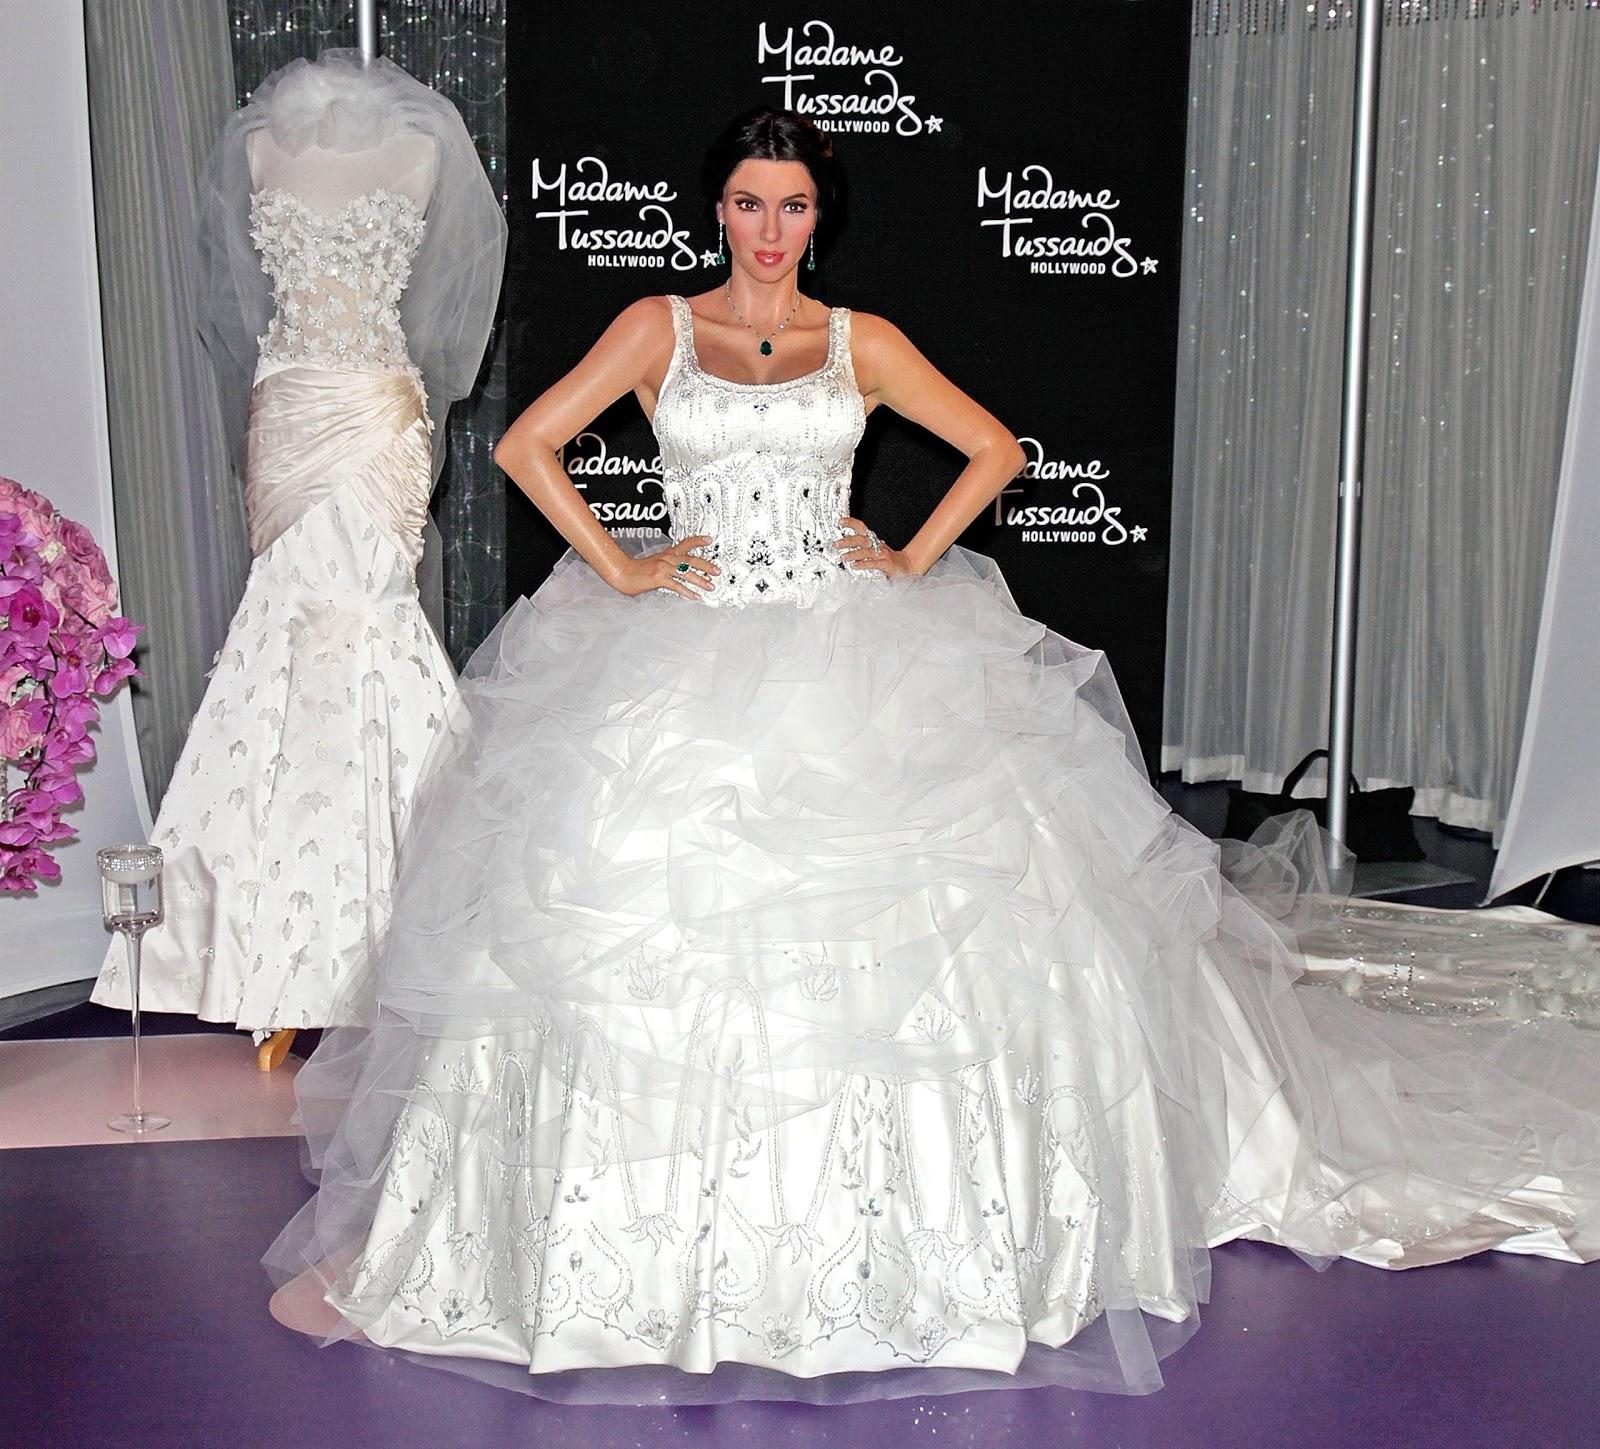 http://2.bp.blogspot.com/-BxC1dyZZVb8/TlevJHEKckI/AAAAAAAABVY/b9bsyyBC0aY/s1600/Kim+Kardashian%2527s+Three+Wedding+Dresses+Revealed%2521+2.jpg